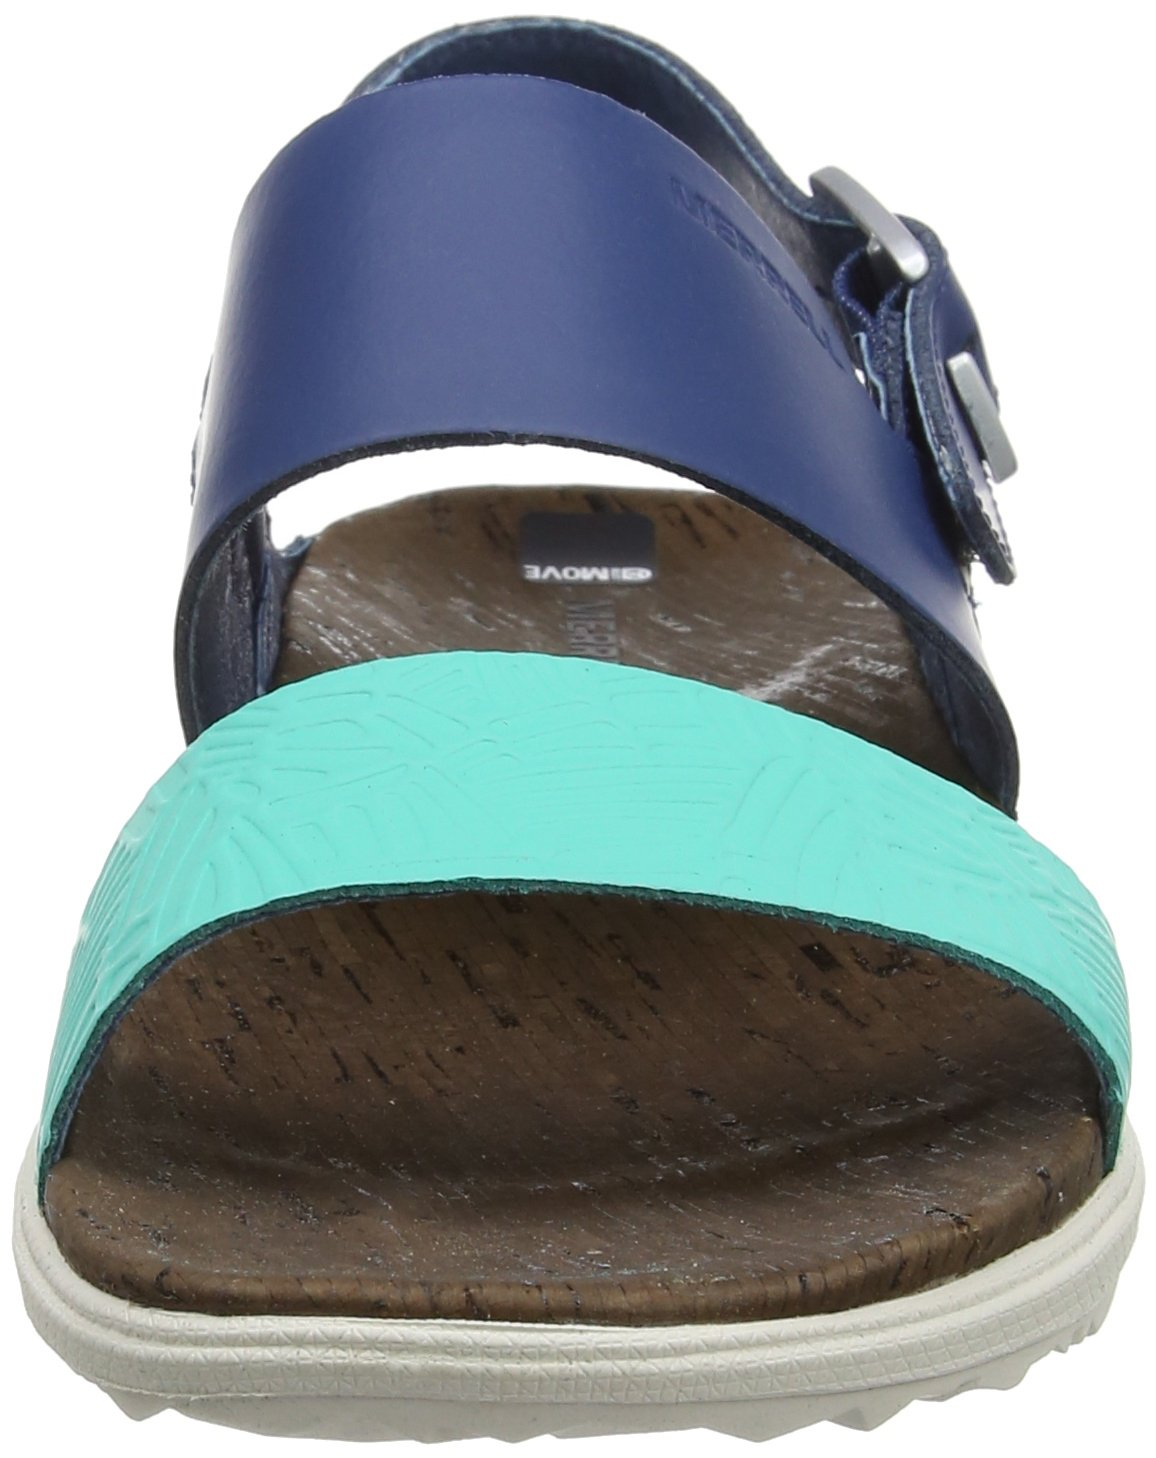 Merrell Women's Around Town Backstrap Sandal B01HHJMFQI 5 B(M) US|Poseidon